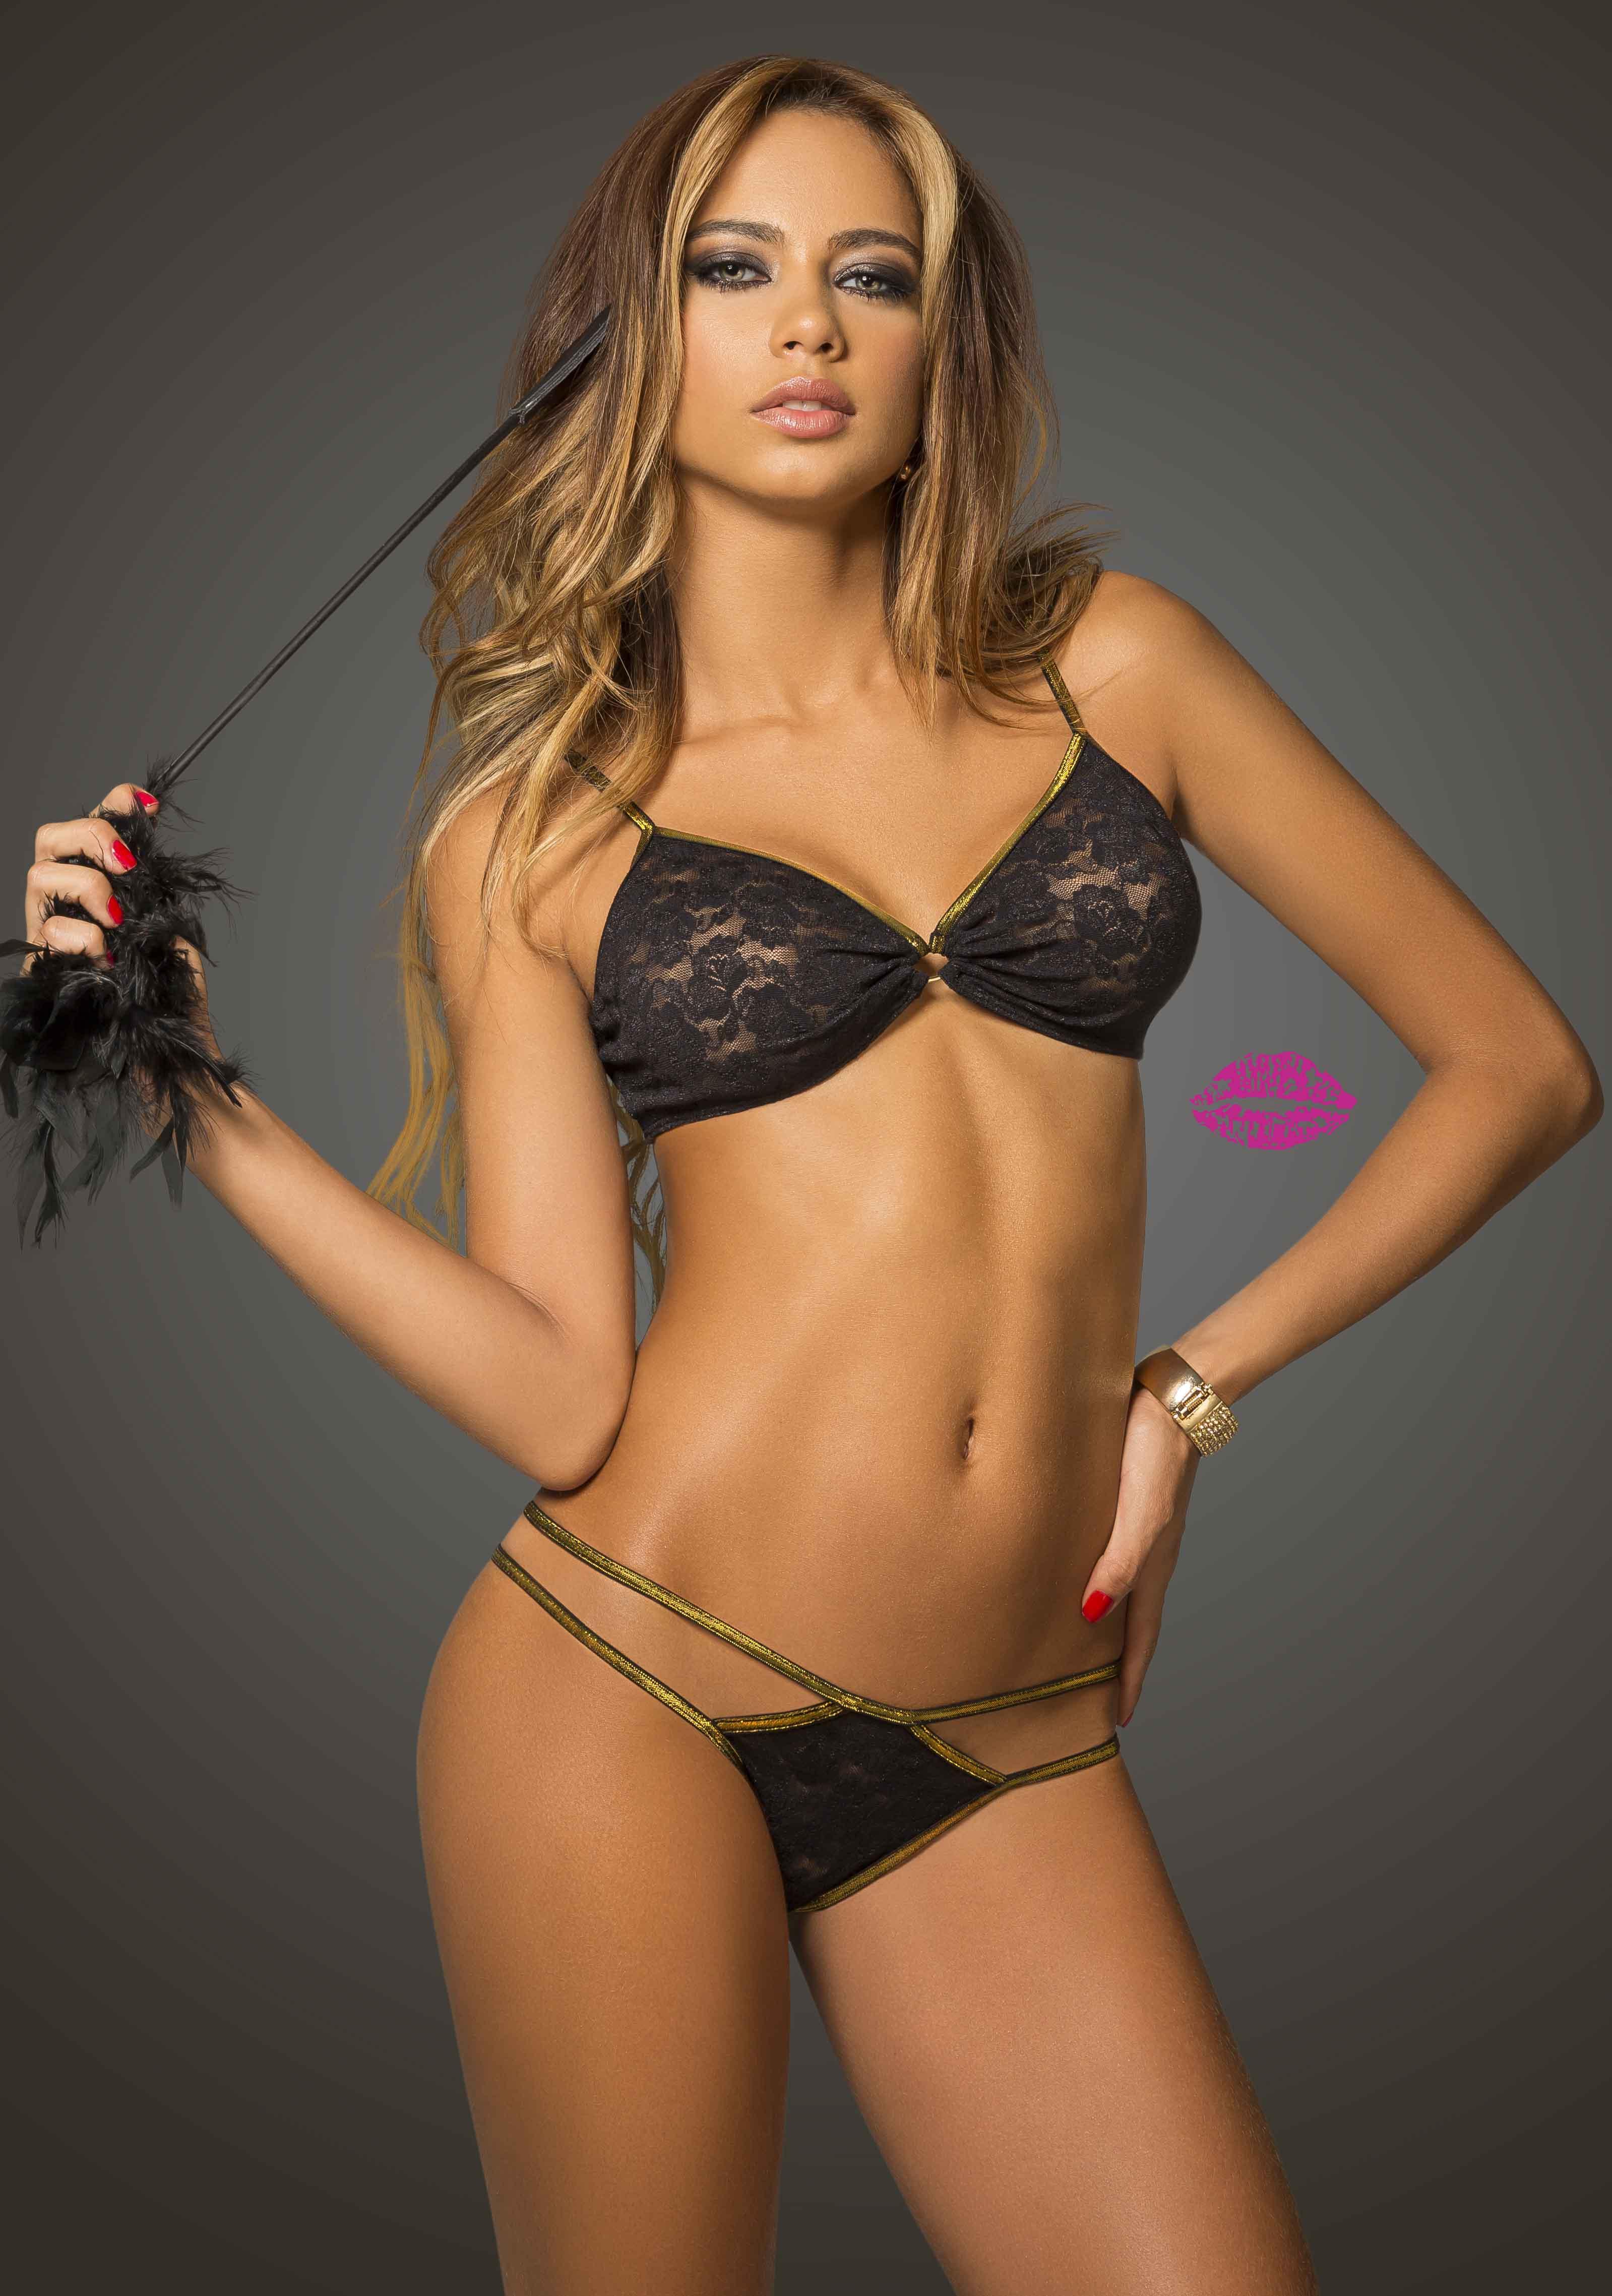 Catalina Otalvaro in Besame lingerie collection 2014. Catalina Otalvaro в шикарной рекламной фотосессии нижнего белья Besame Lingerie 2014 года.